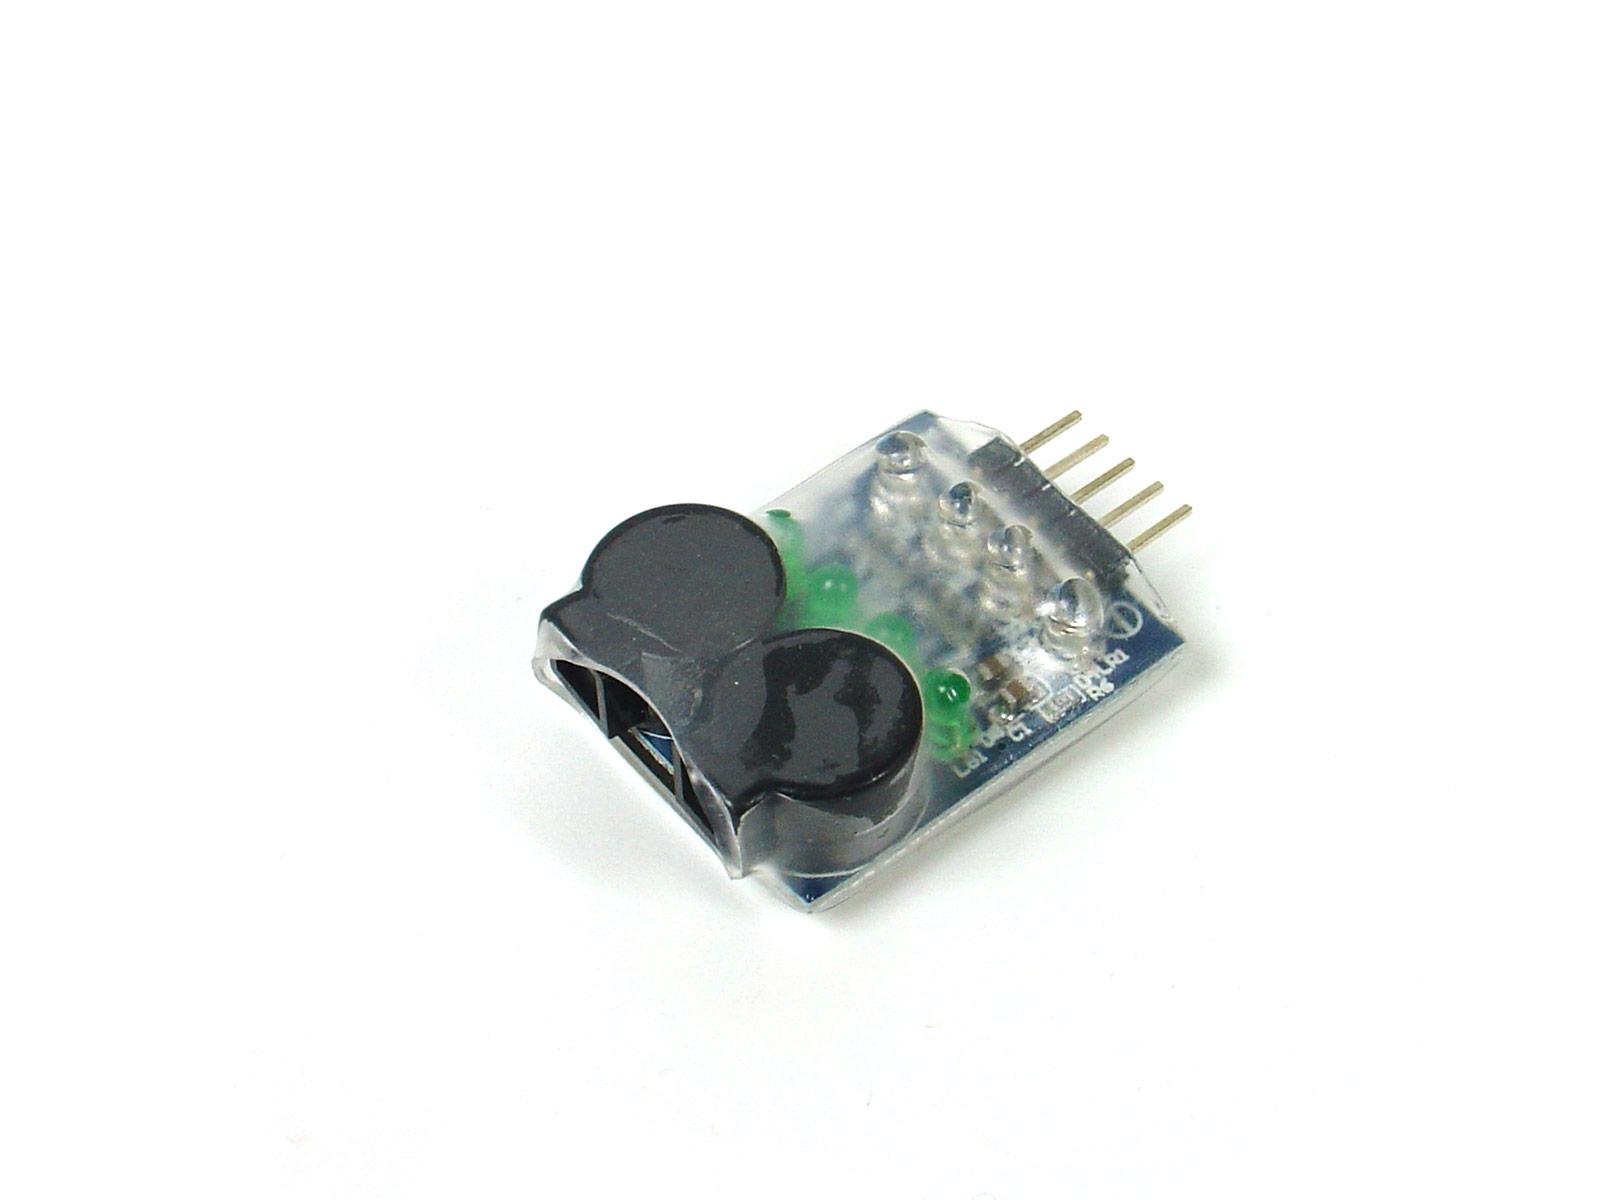 On Board Lipo Low Voltage Alarm 2s 4s Circuit